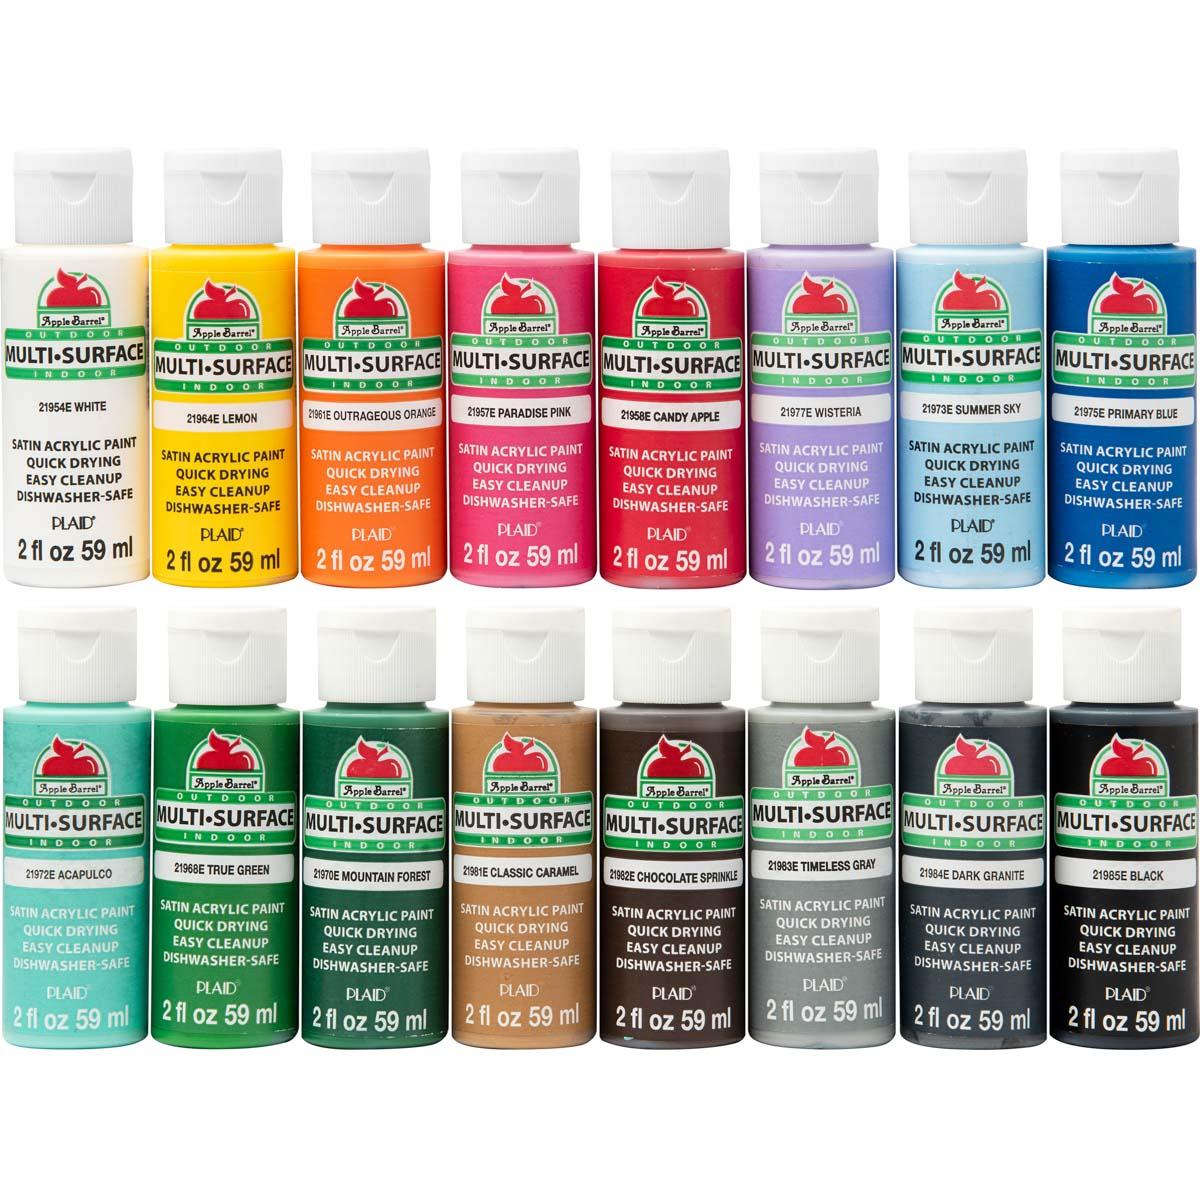 Apple Barrel ® Multi-Surface Satin Acrylic Paint 16 Color Set - PROMOABMS1